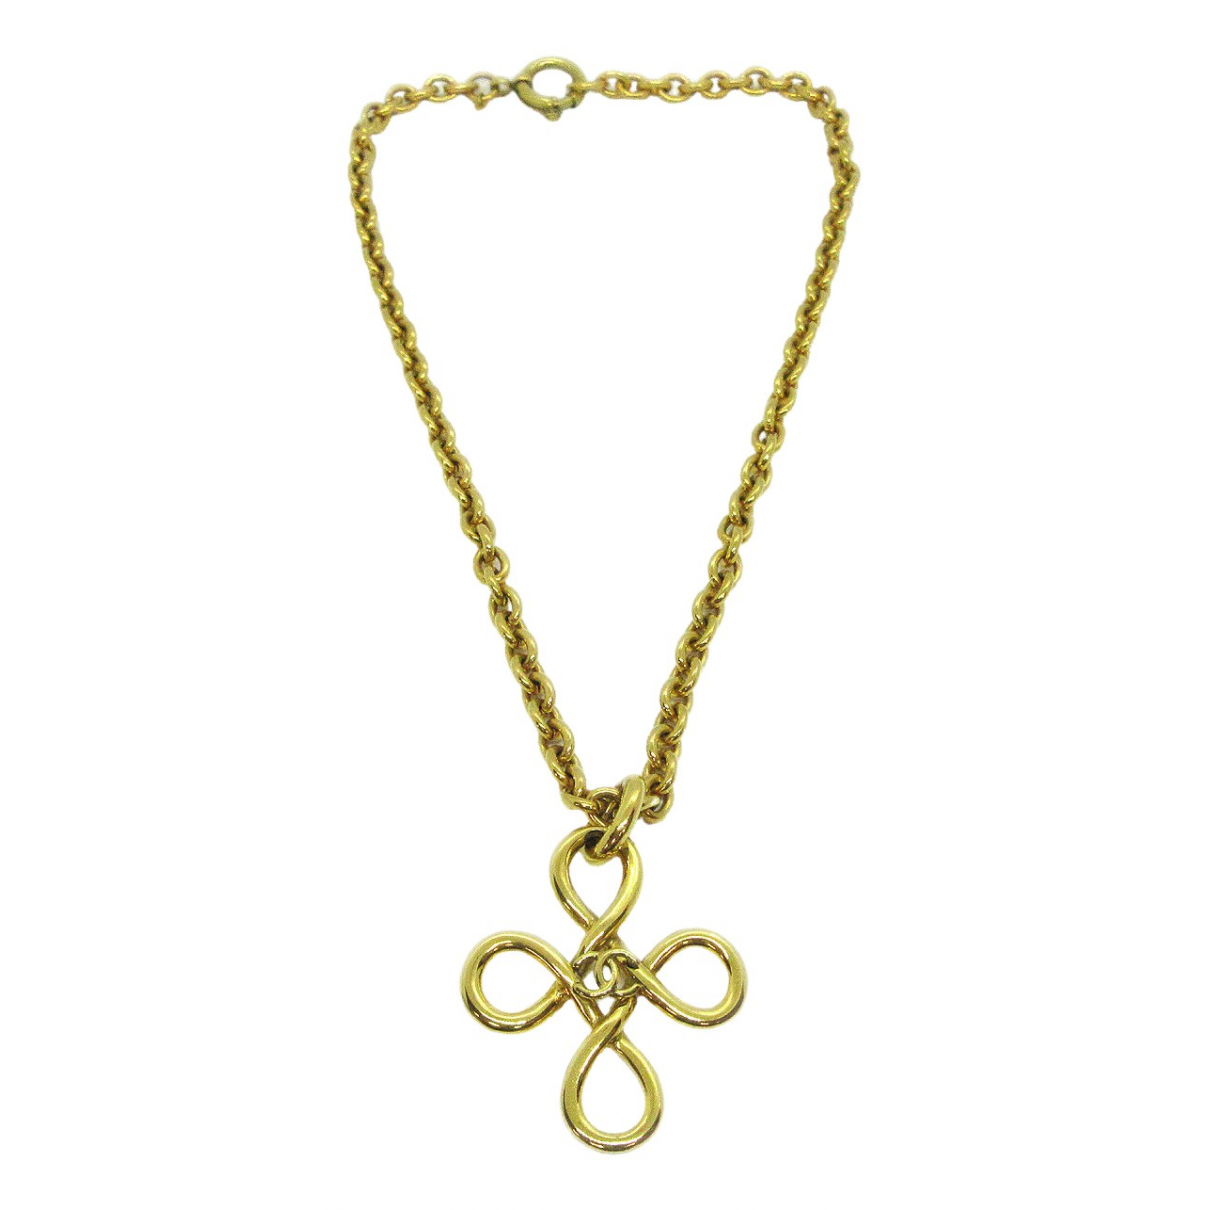 Chanel \N Kette in Metall